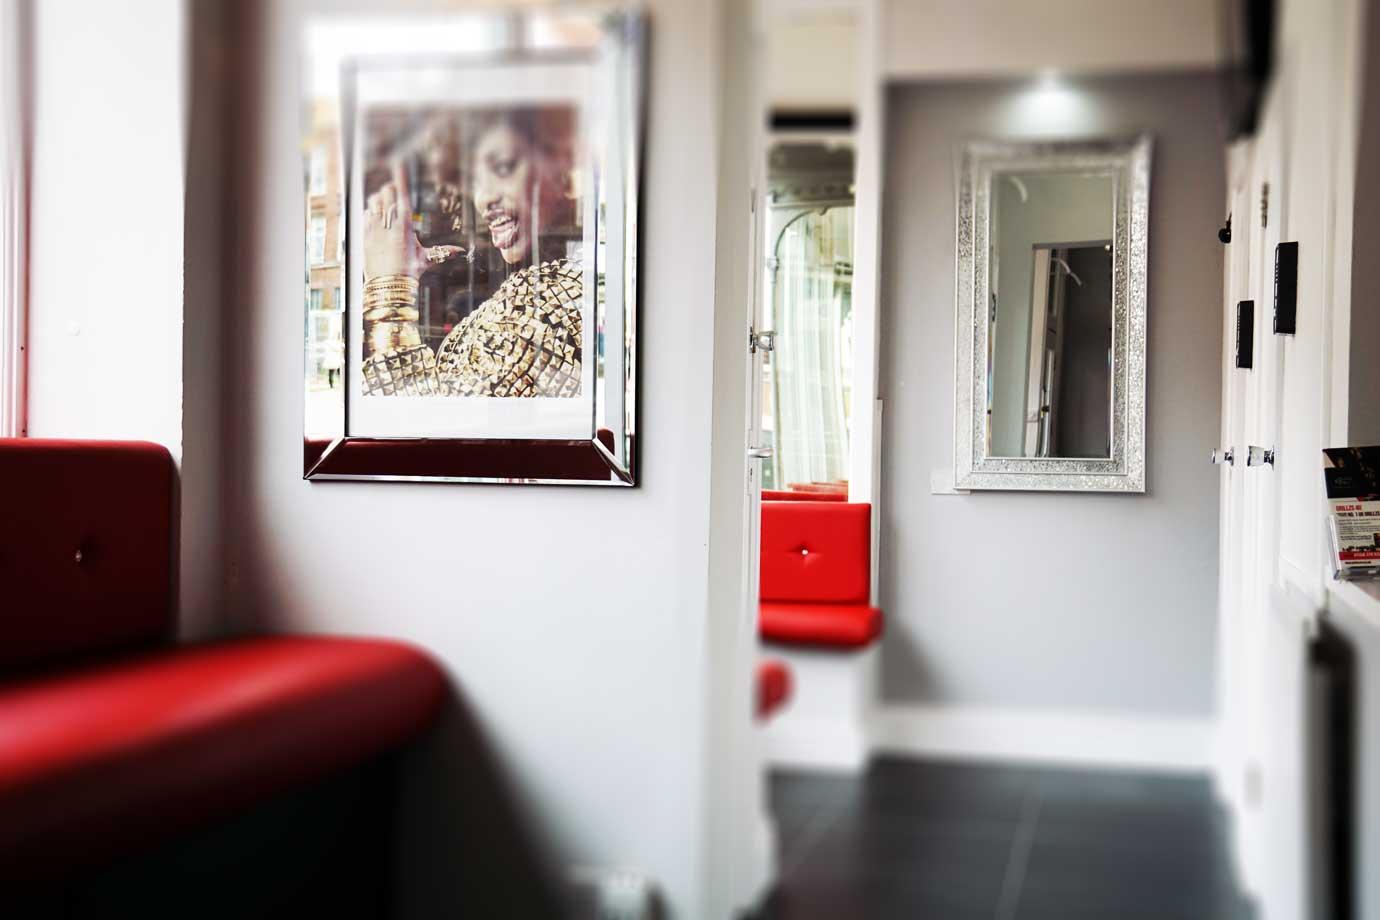 Grillzs-4u-Interior-Red-Seating